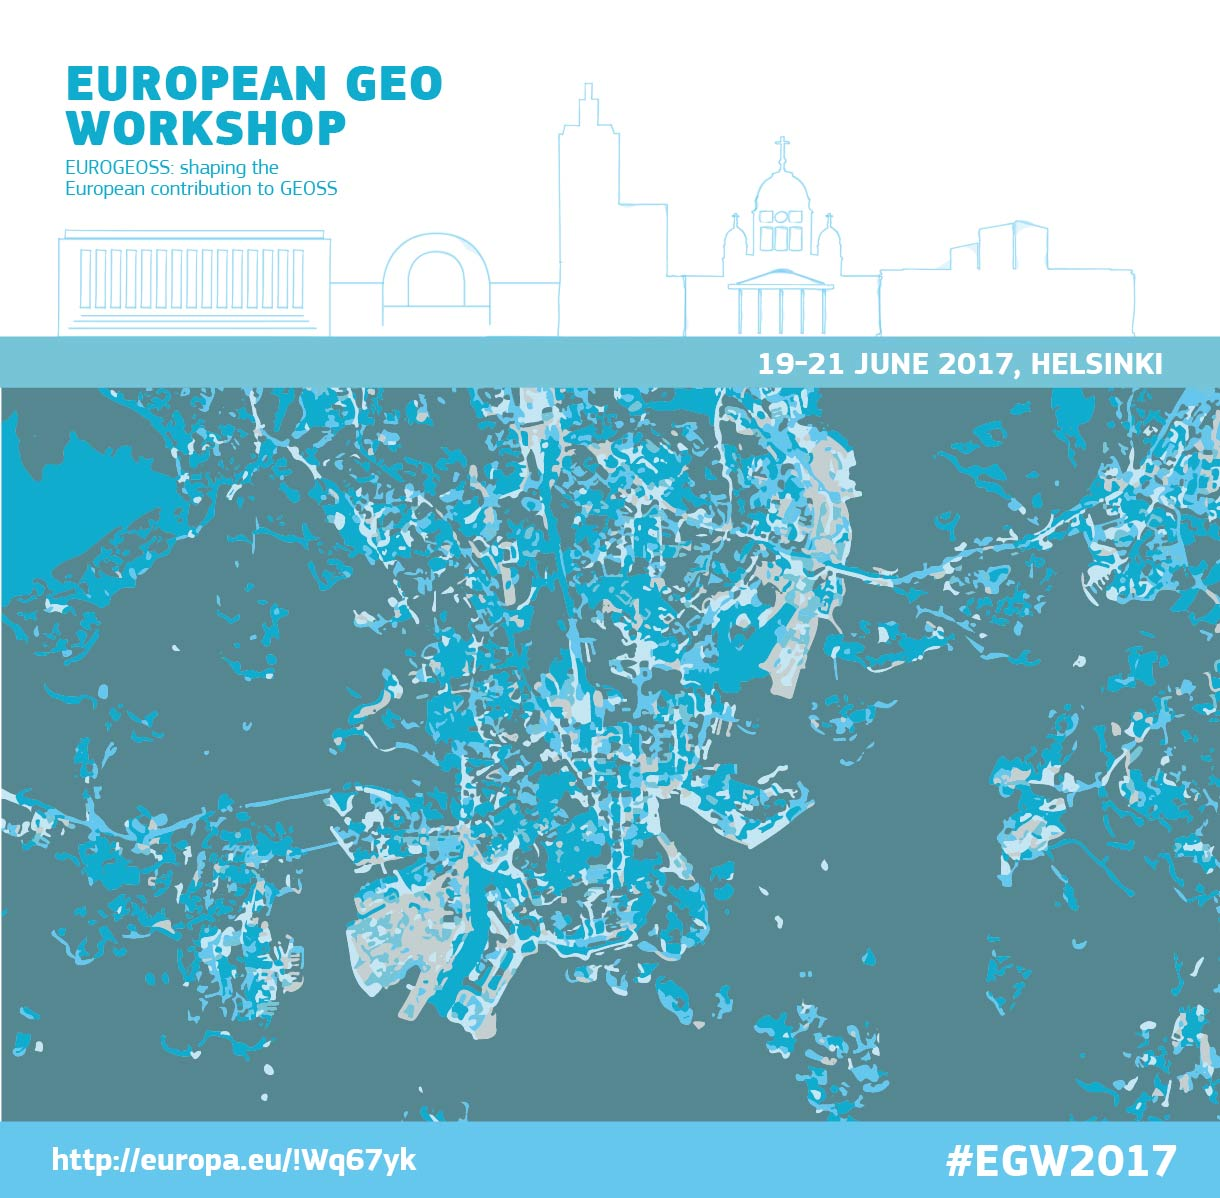 European GEO Workshop 2017